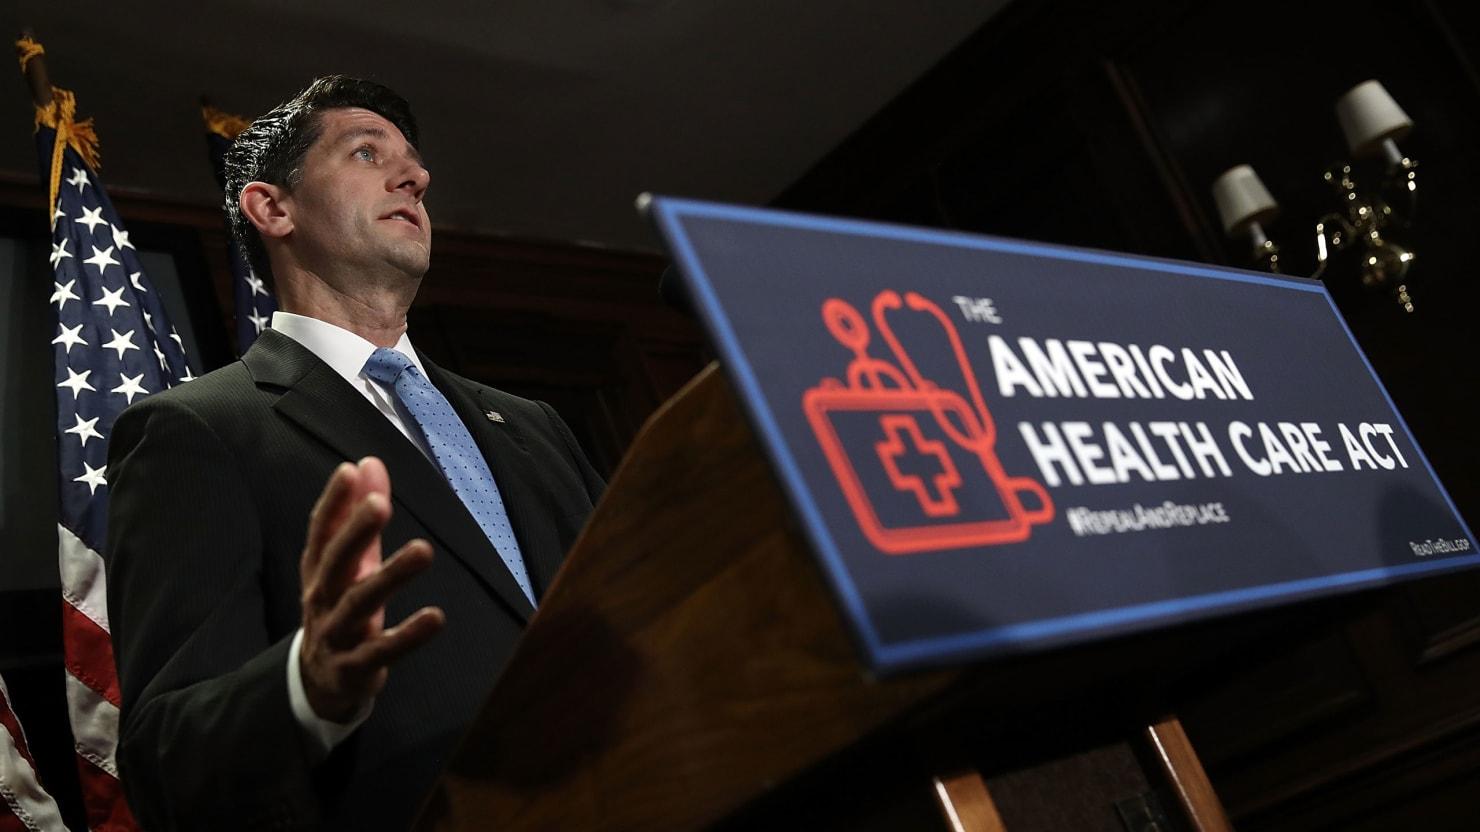 Donald Trump Joins Paul Ryan's 'Health-Care' Crusade—Sad!